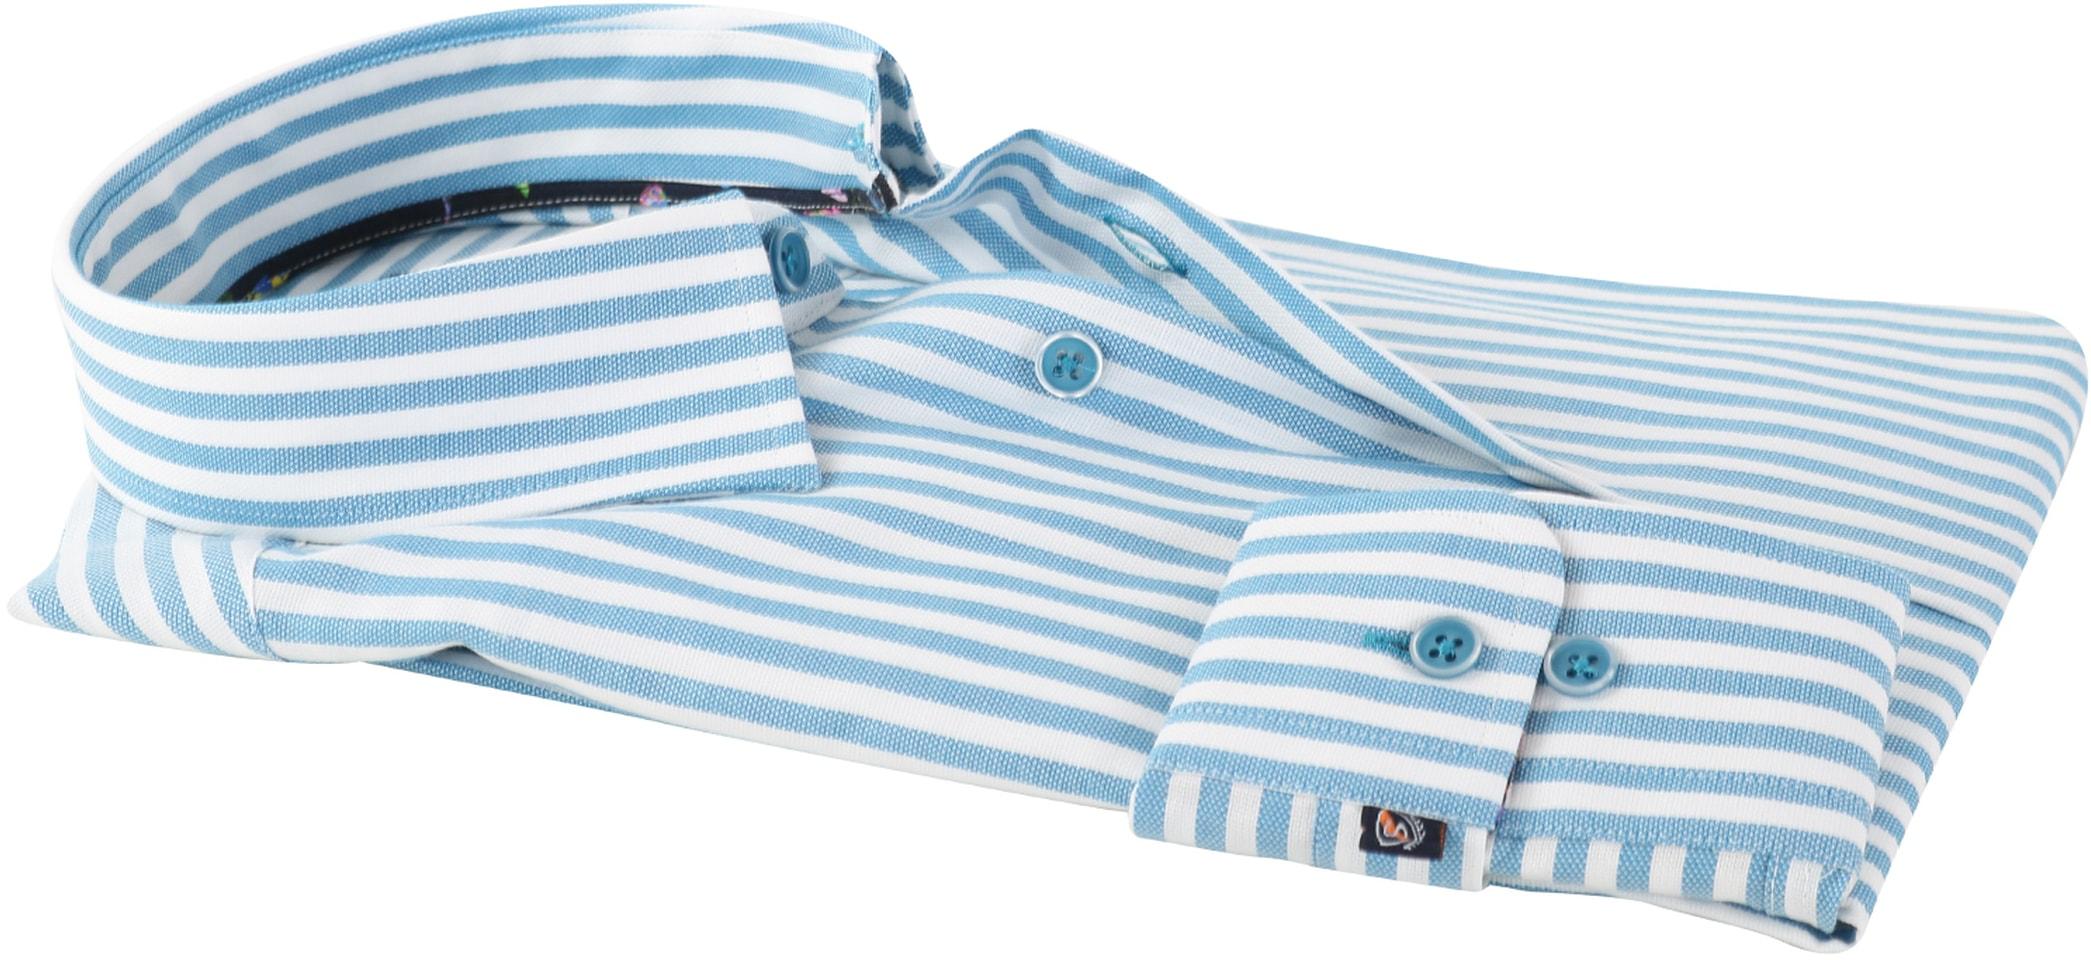 Overhemd Blauw Streep 154-4 foto 2